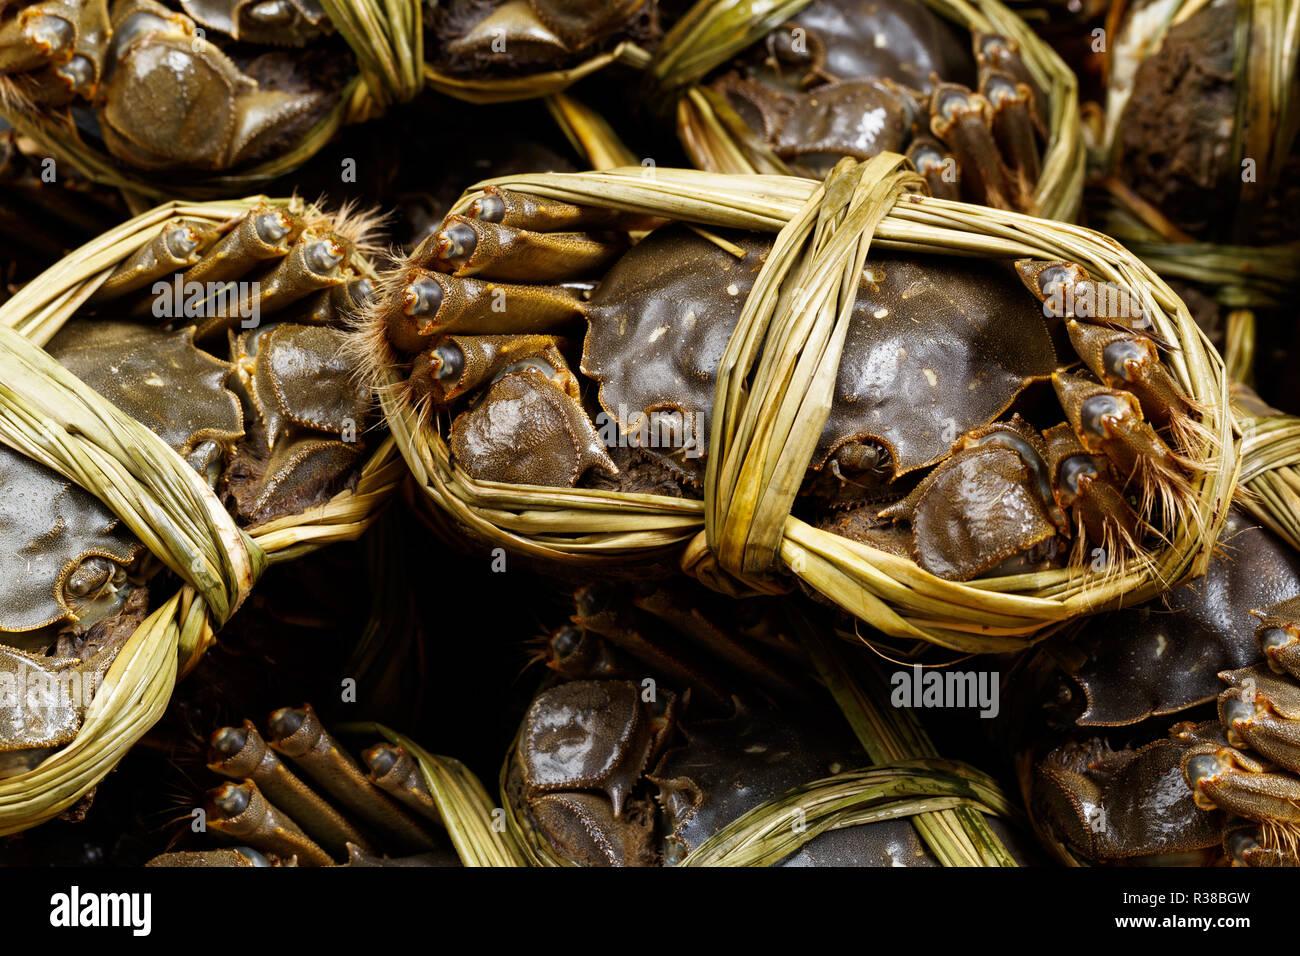 Shanghai Hairy Crab Stock Photos Shanghai Hairy Crab Stock